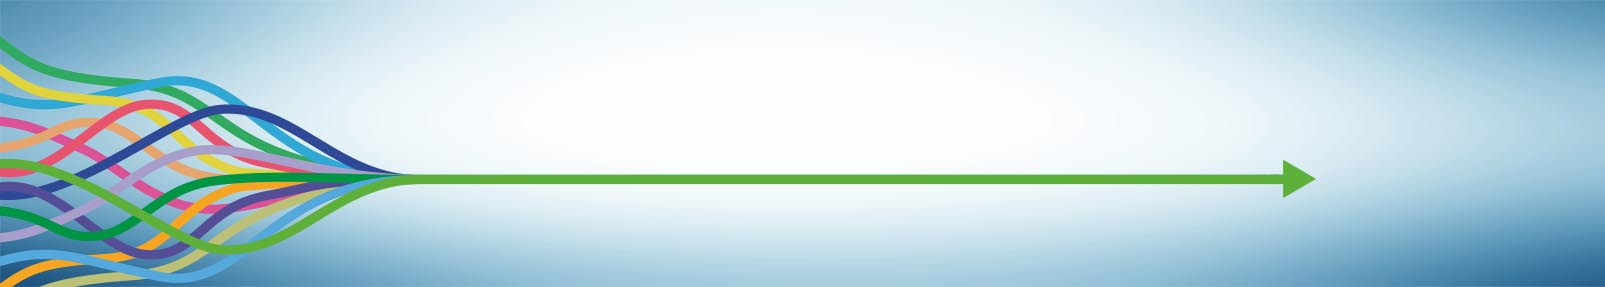 DW_SmartDocumentControl_Website_Header-Image_green